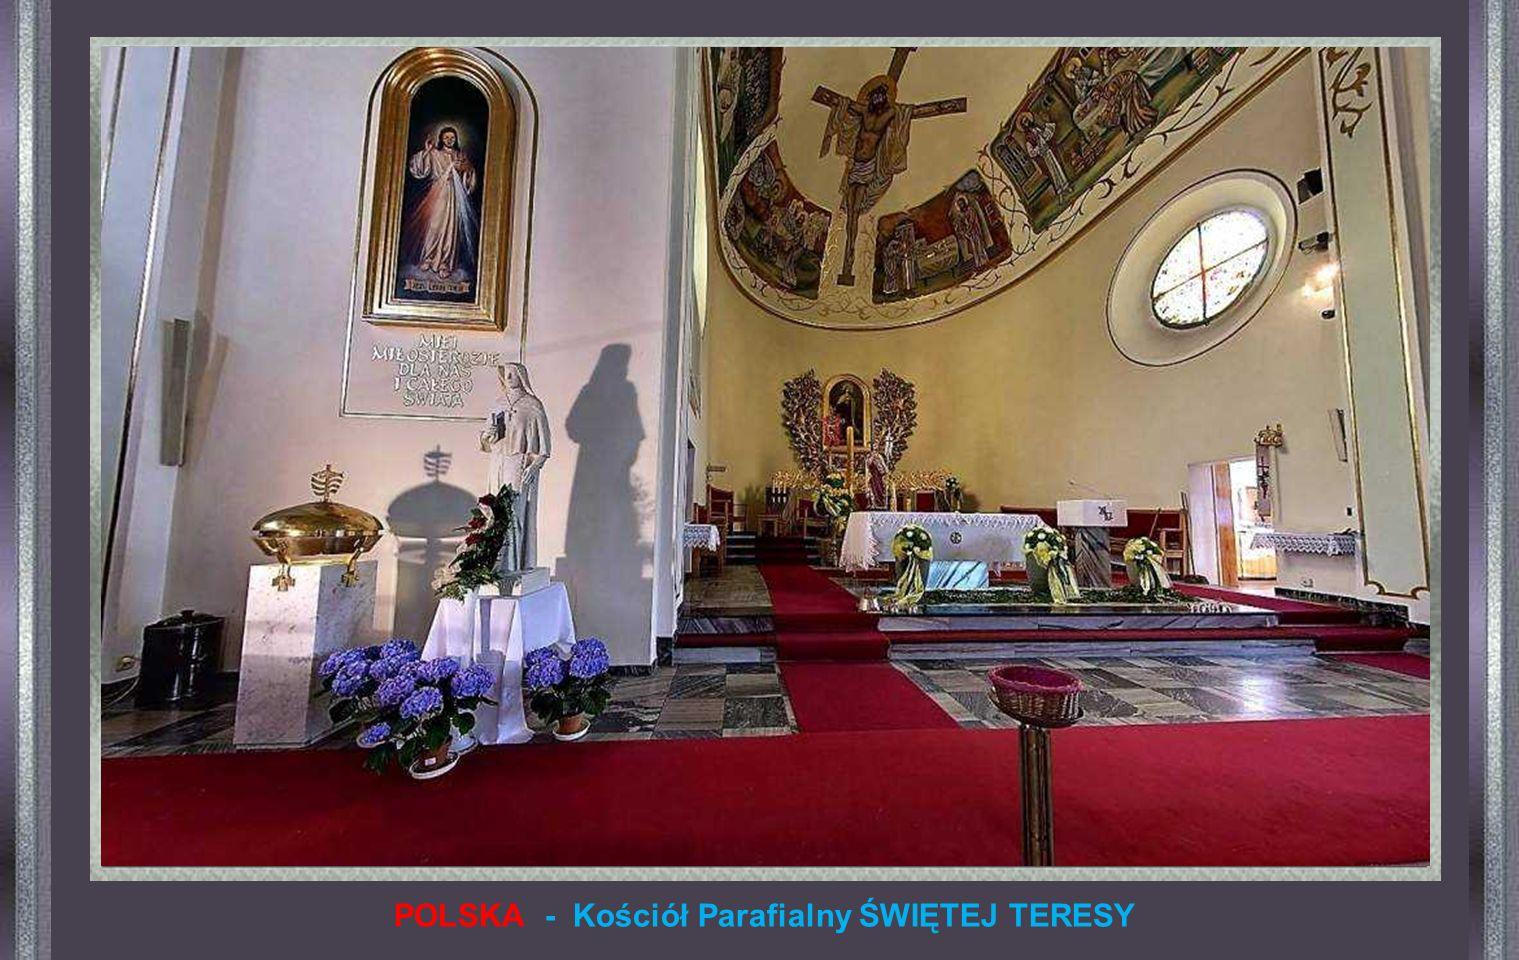 POLSKA - Kościół Parafialny ŚWIĘTEJ TERESY